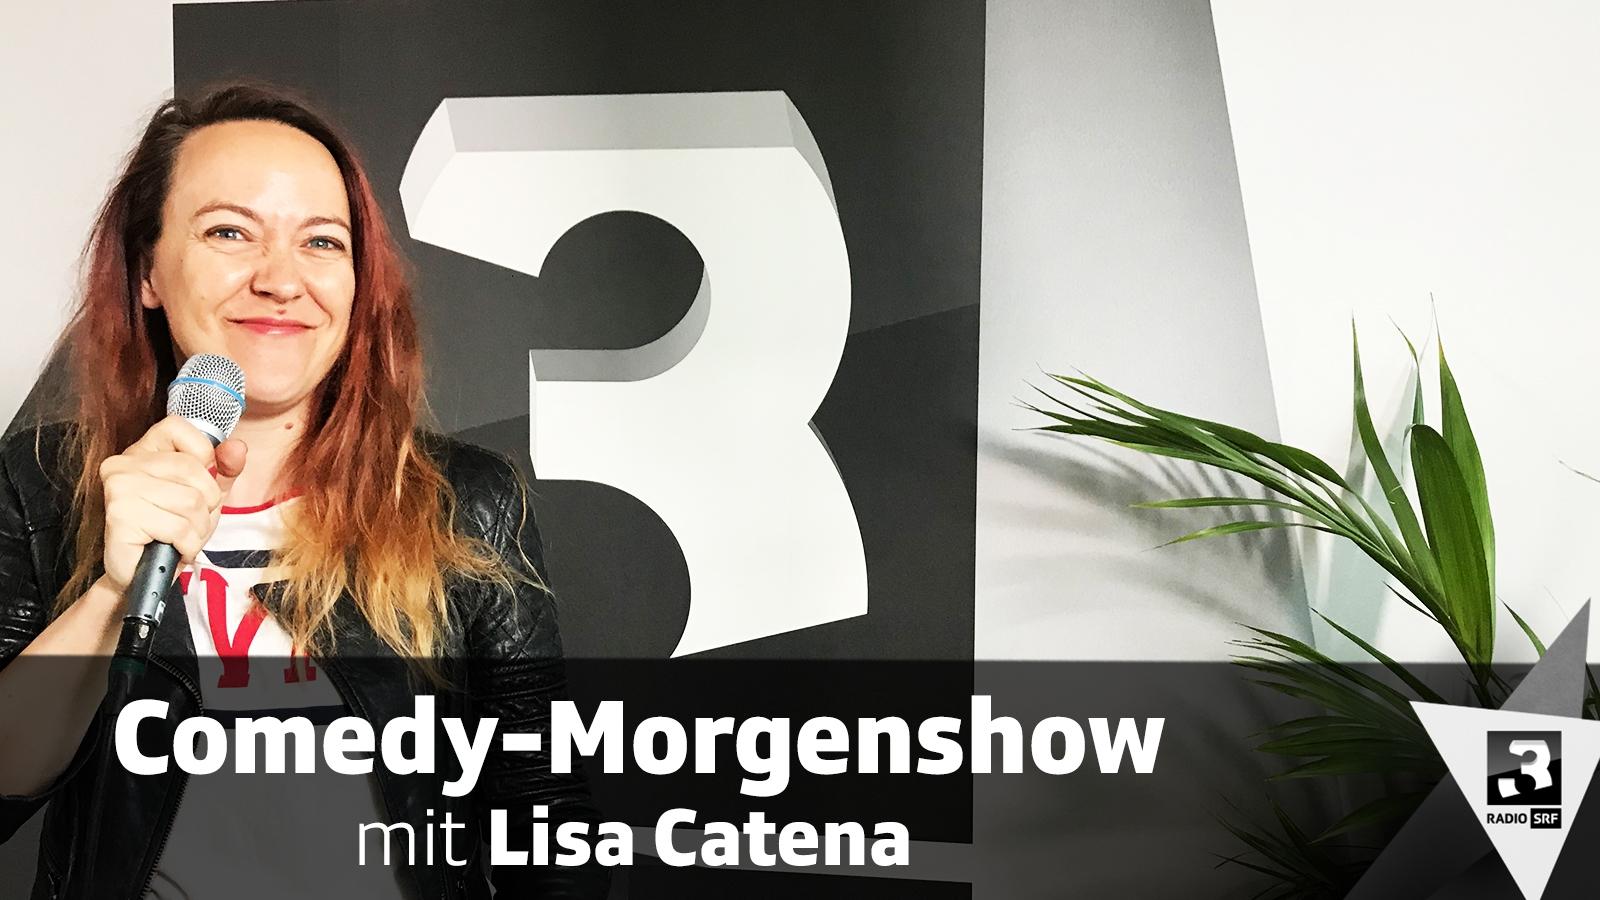 Comedy-Morgenshow mit Lisa Catena